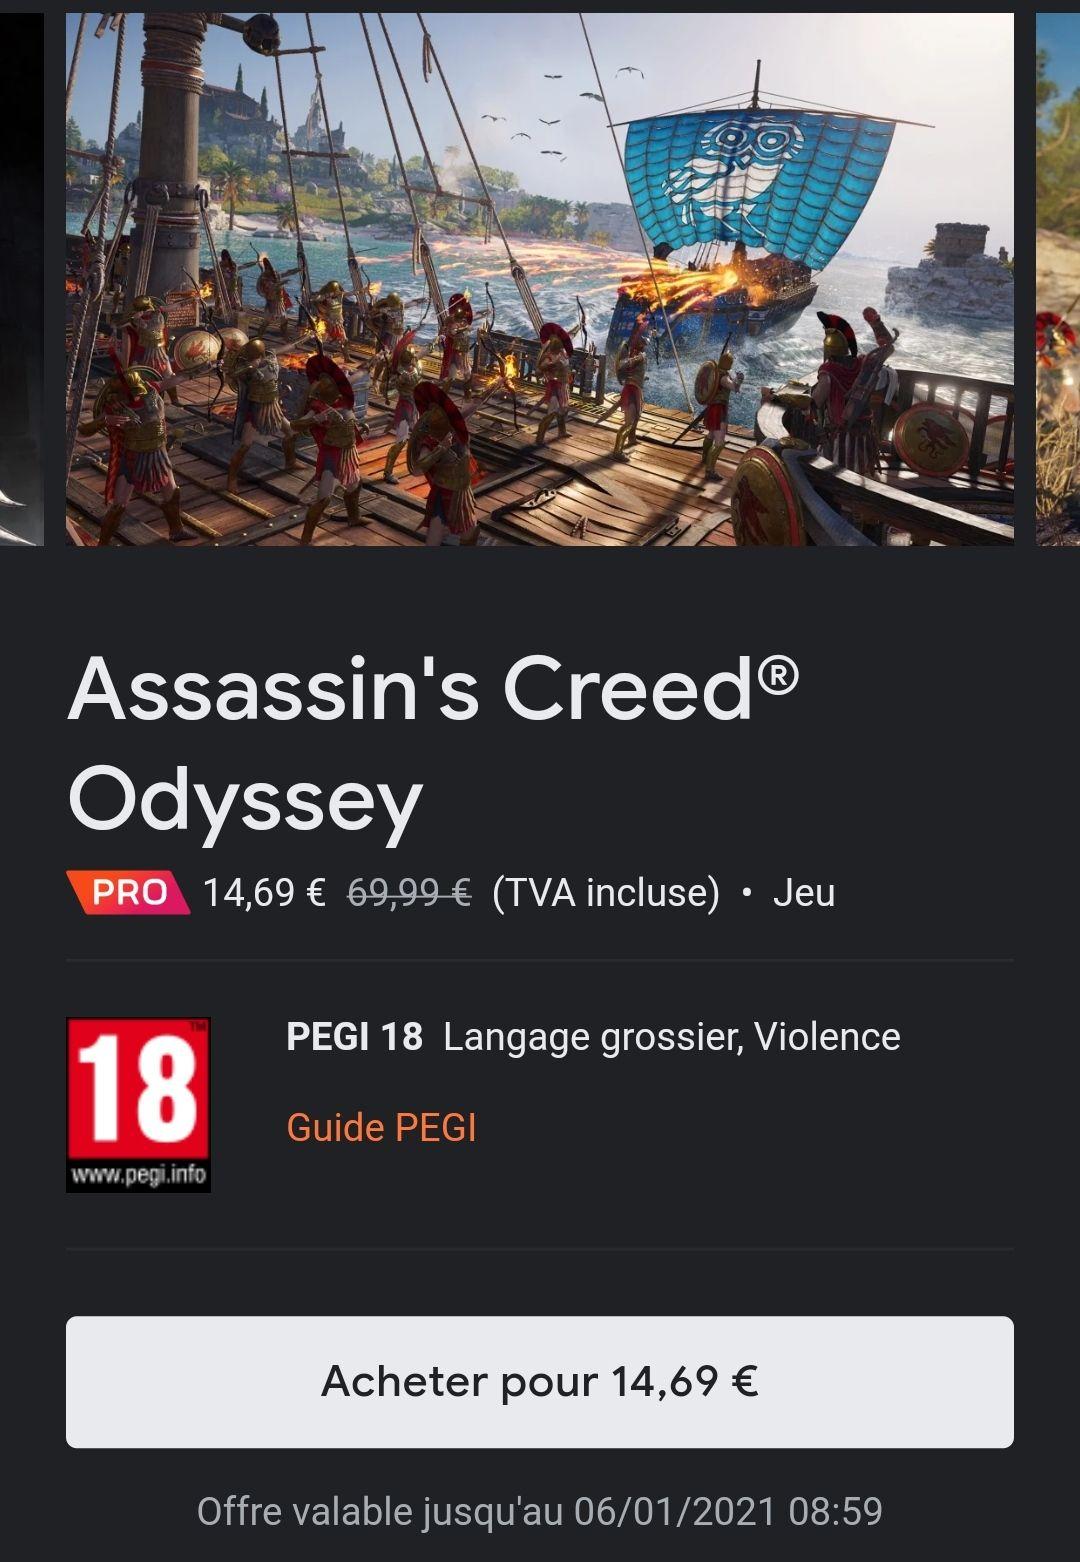 [Stadia Pro] Jeu Assassin's Creed Odyssey sur Stadia (Dématérialisé)